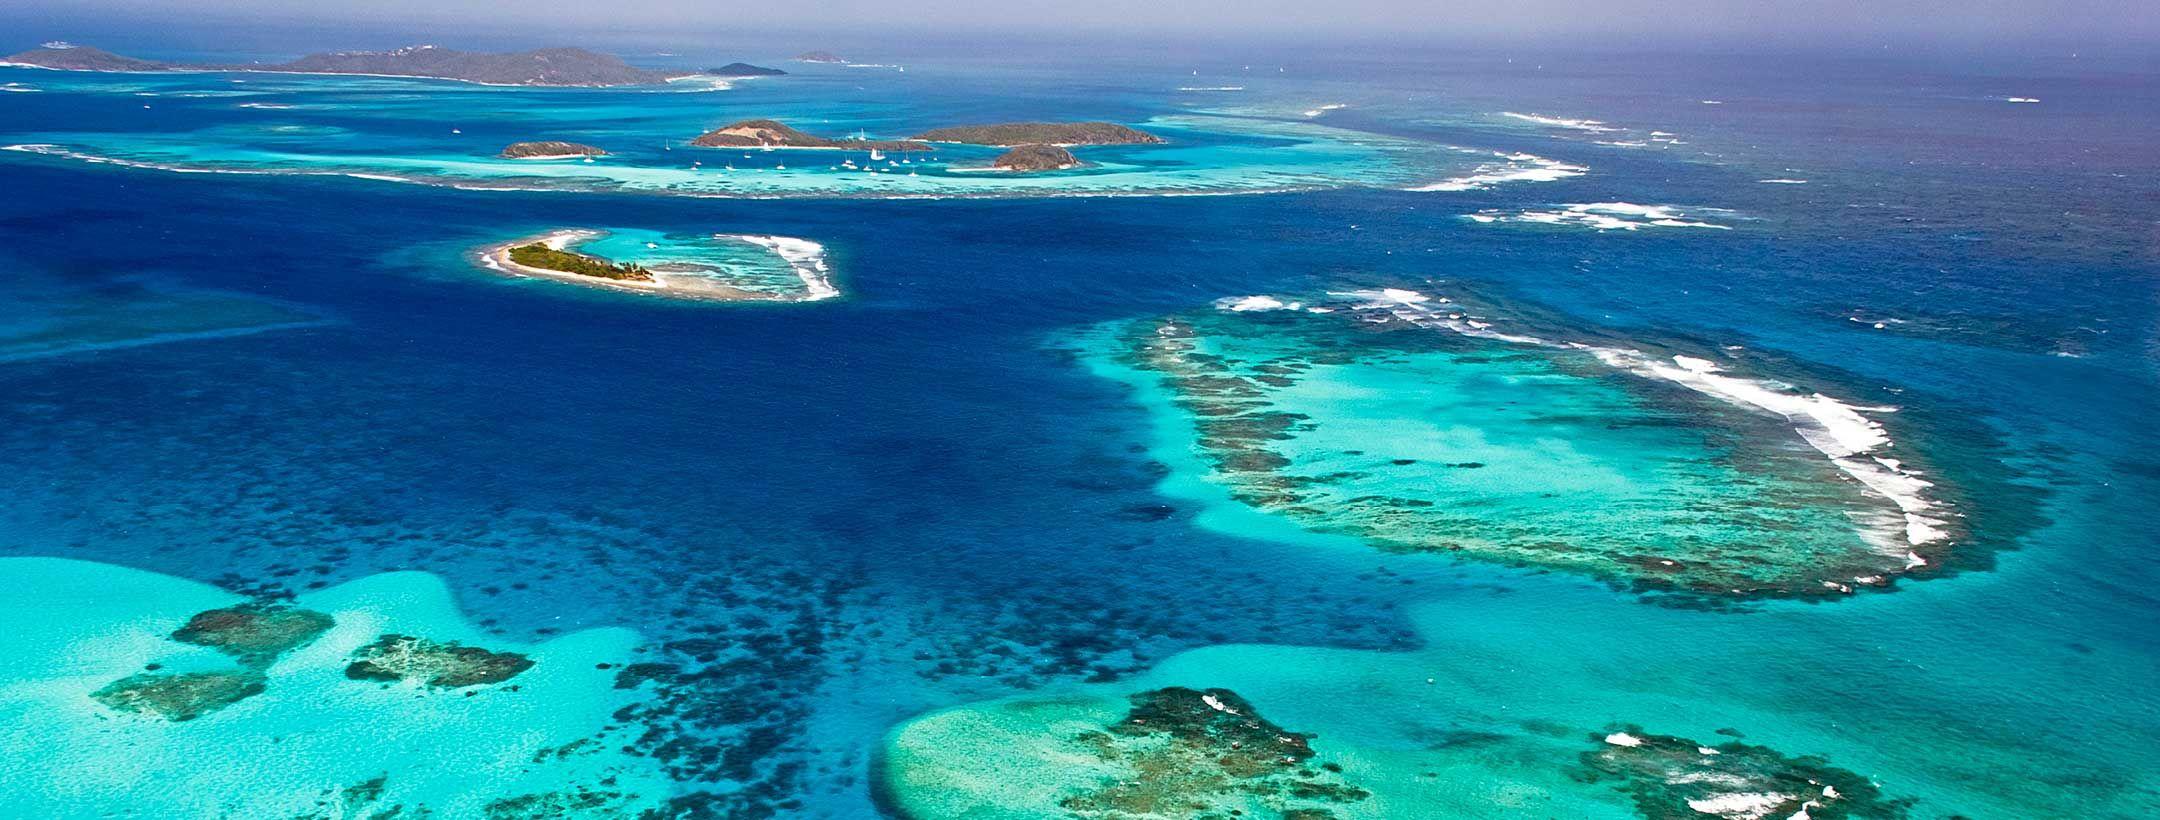 St Kitts The Grenadines Travel Grenadines Saint Vincent Windward Islands